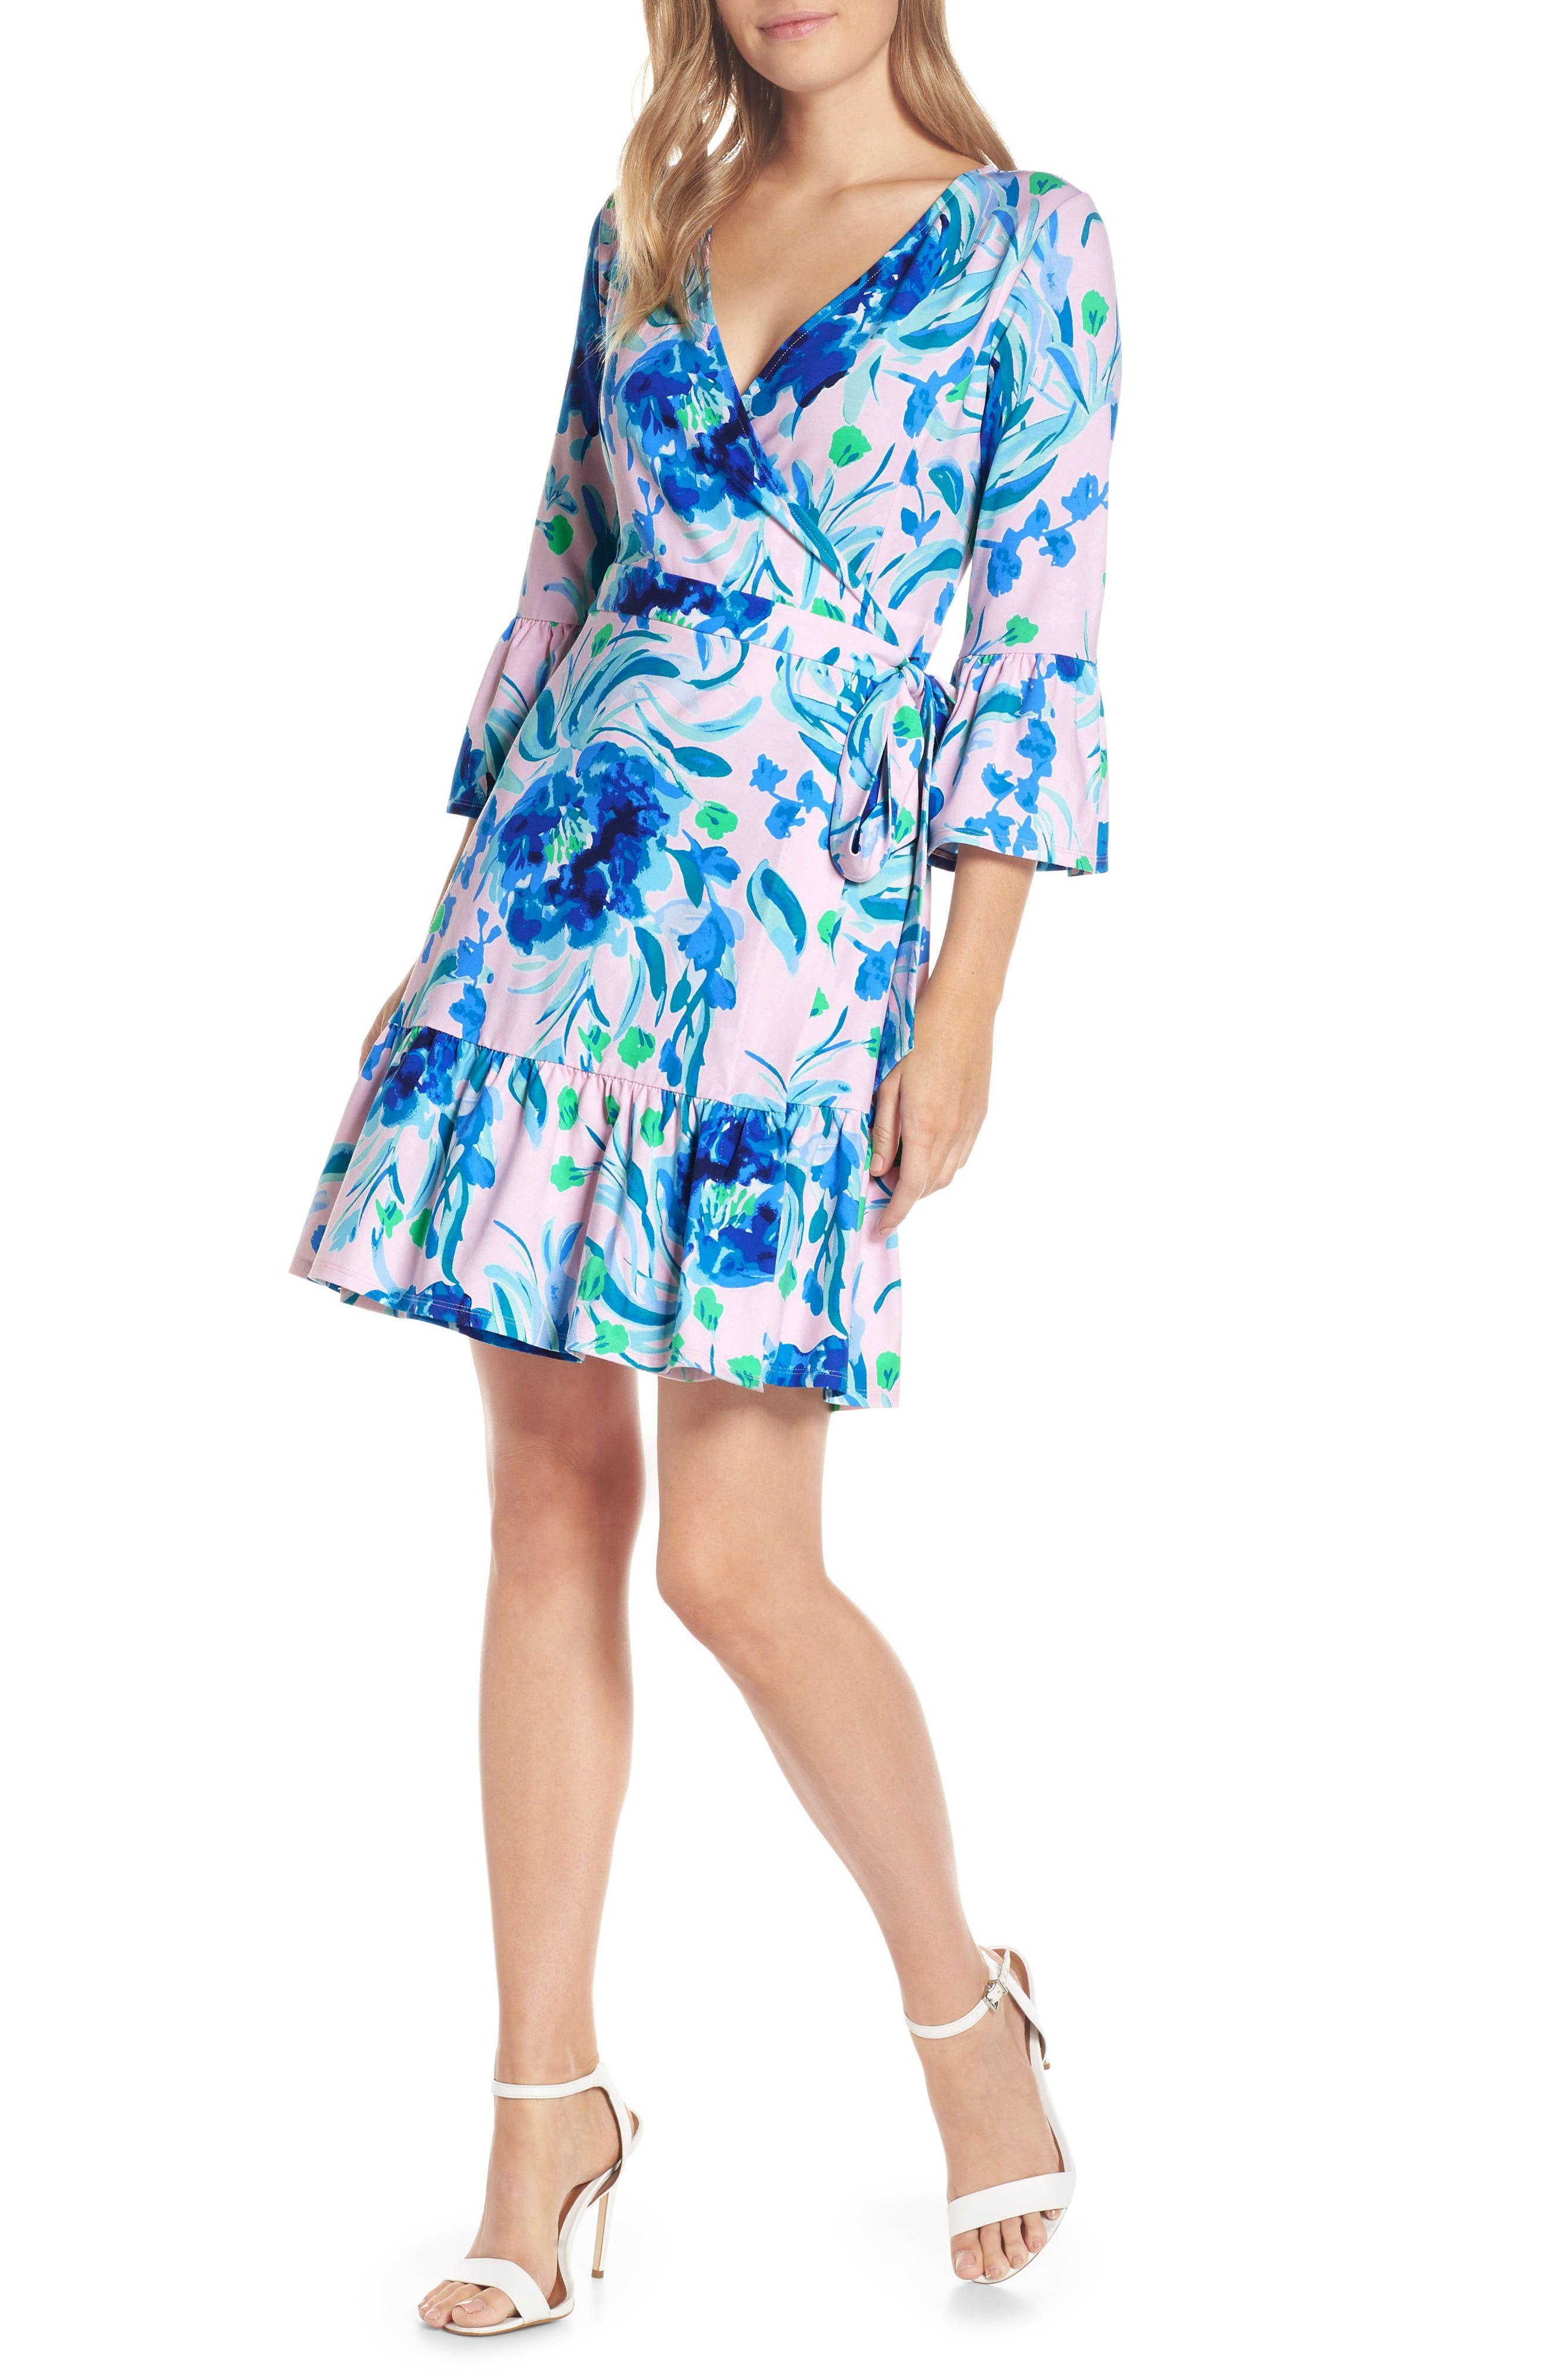 Lilly Pulitzer Misha Wrap Dress Nordstrom Clothes For Women Wrap Dress Fashion Clothes Women [ 4048 x 2640 Pixel ]